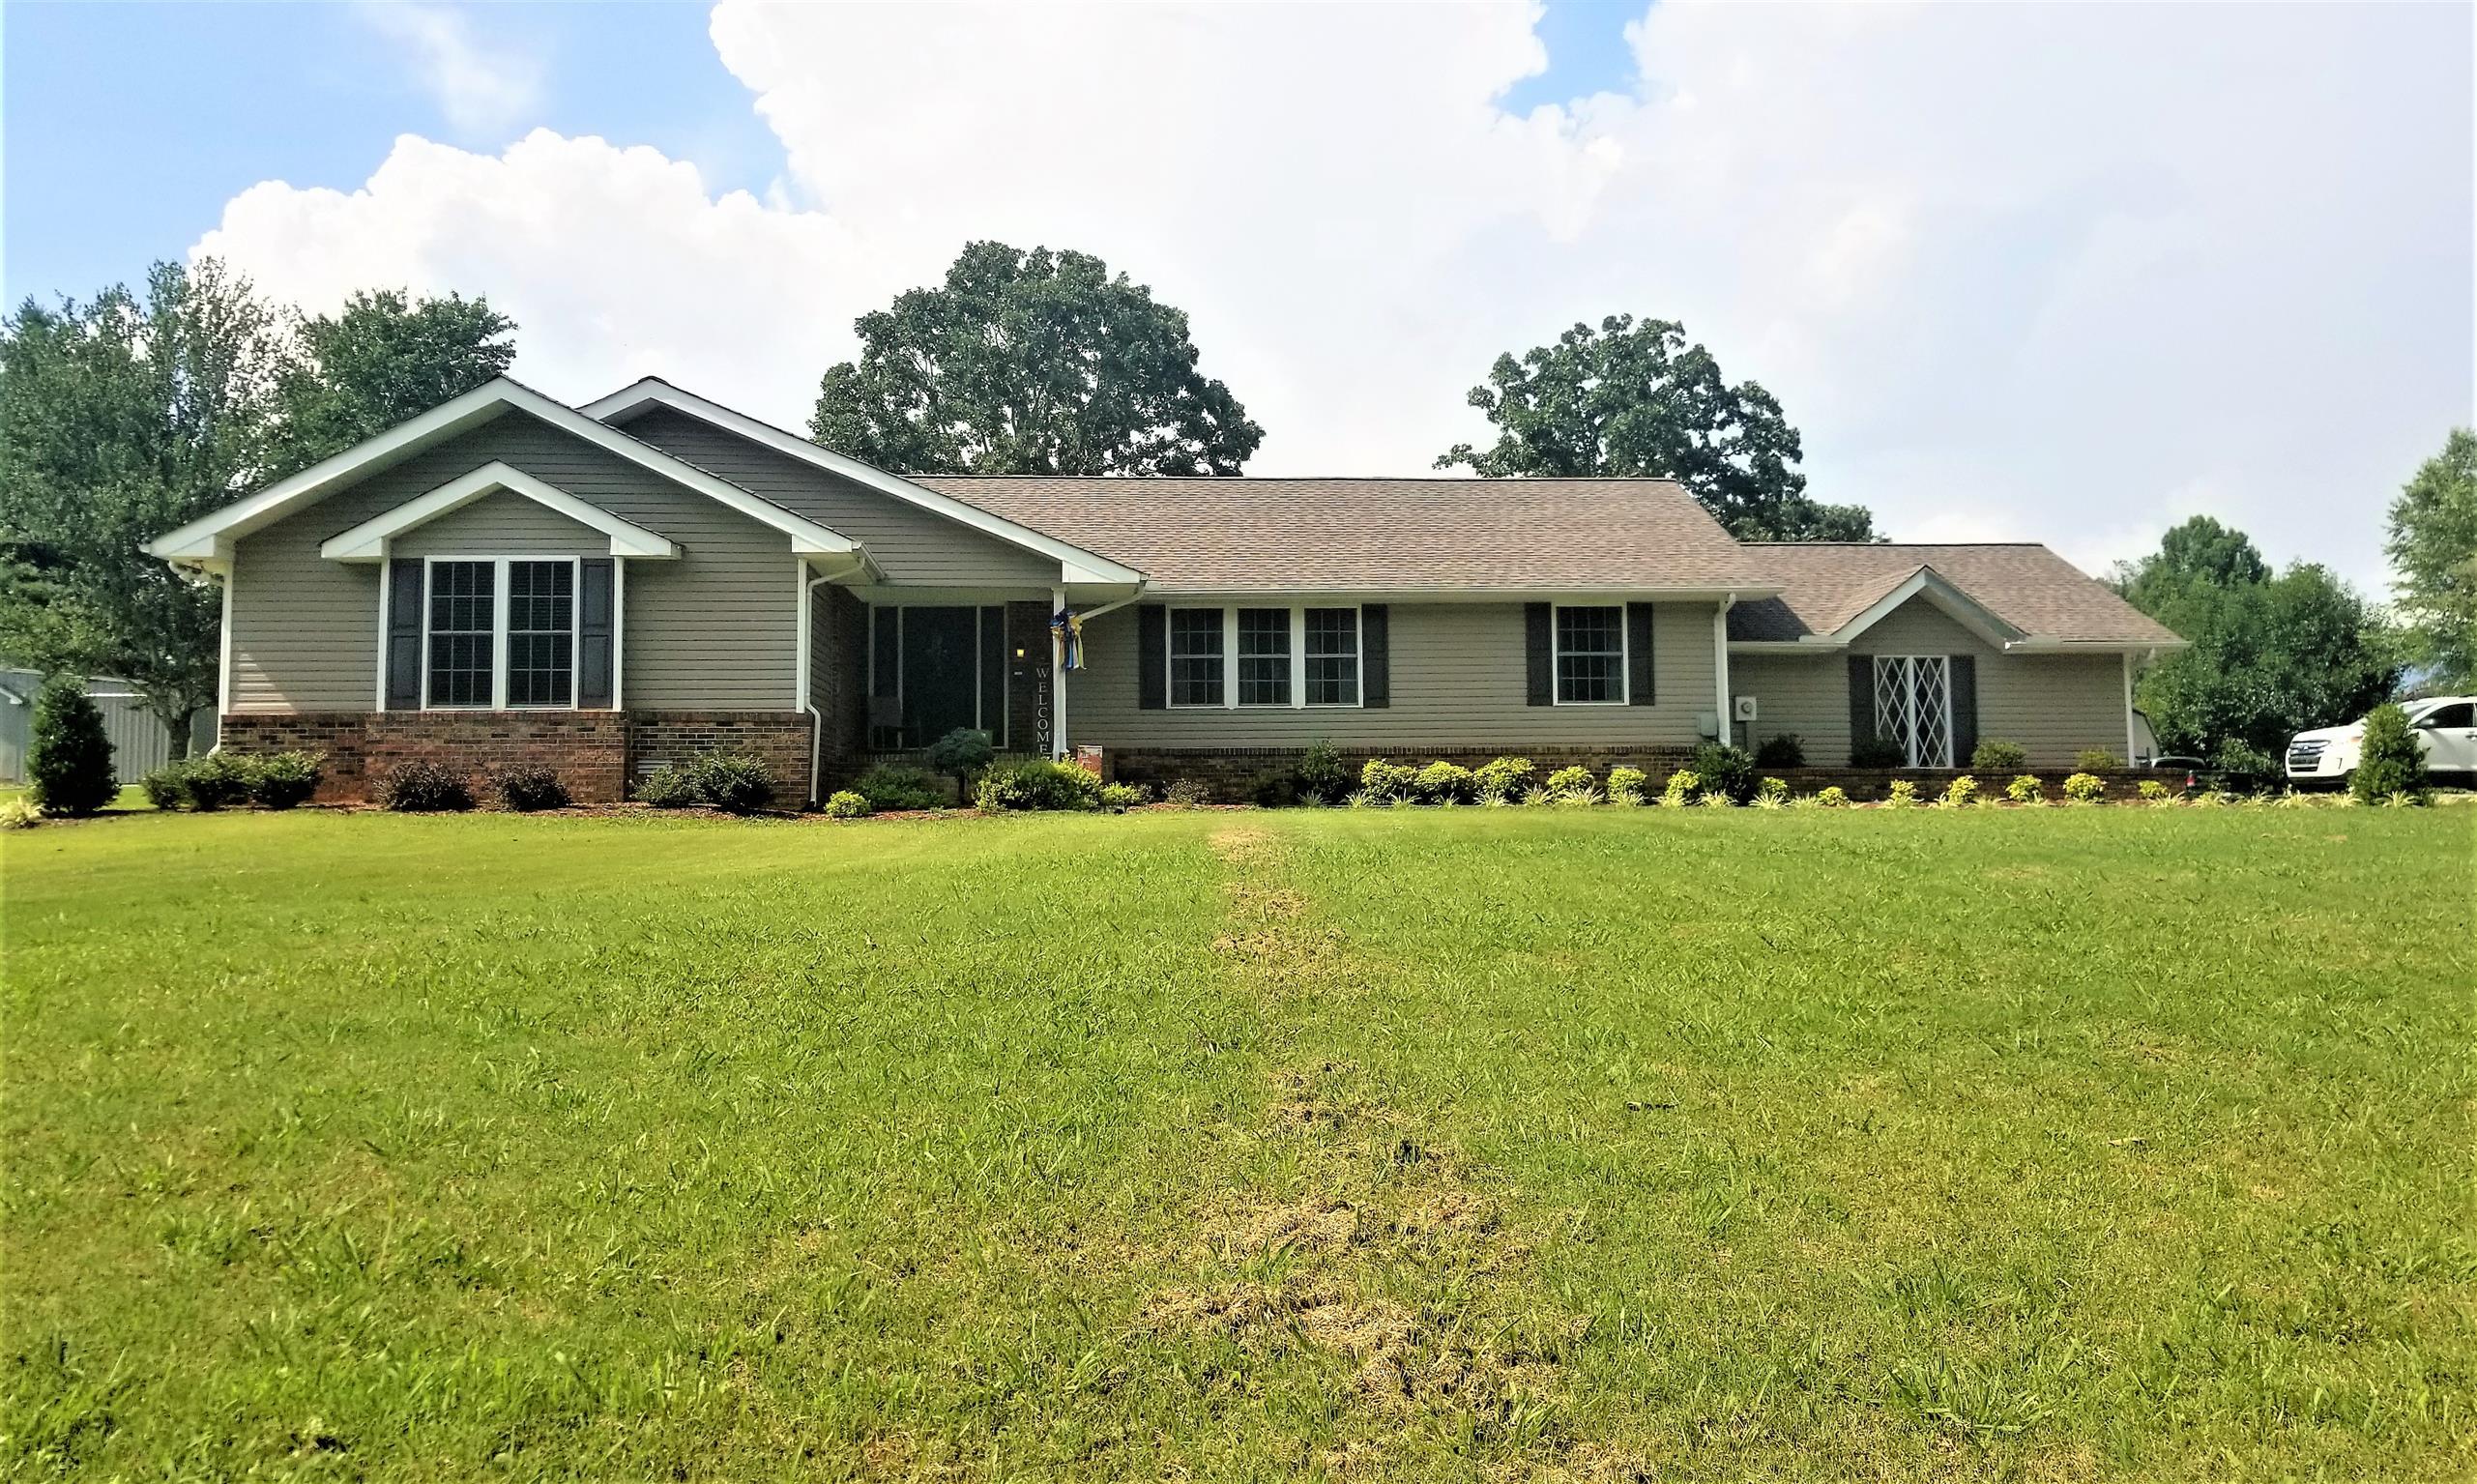 153 Oakwood Trl, McMinnville, TN 37110 - McMinnville, TN real estate listing